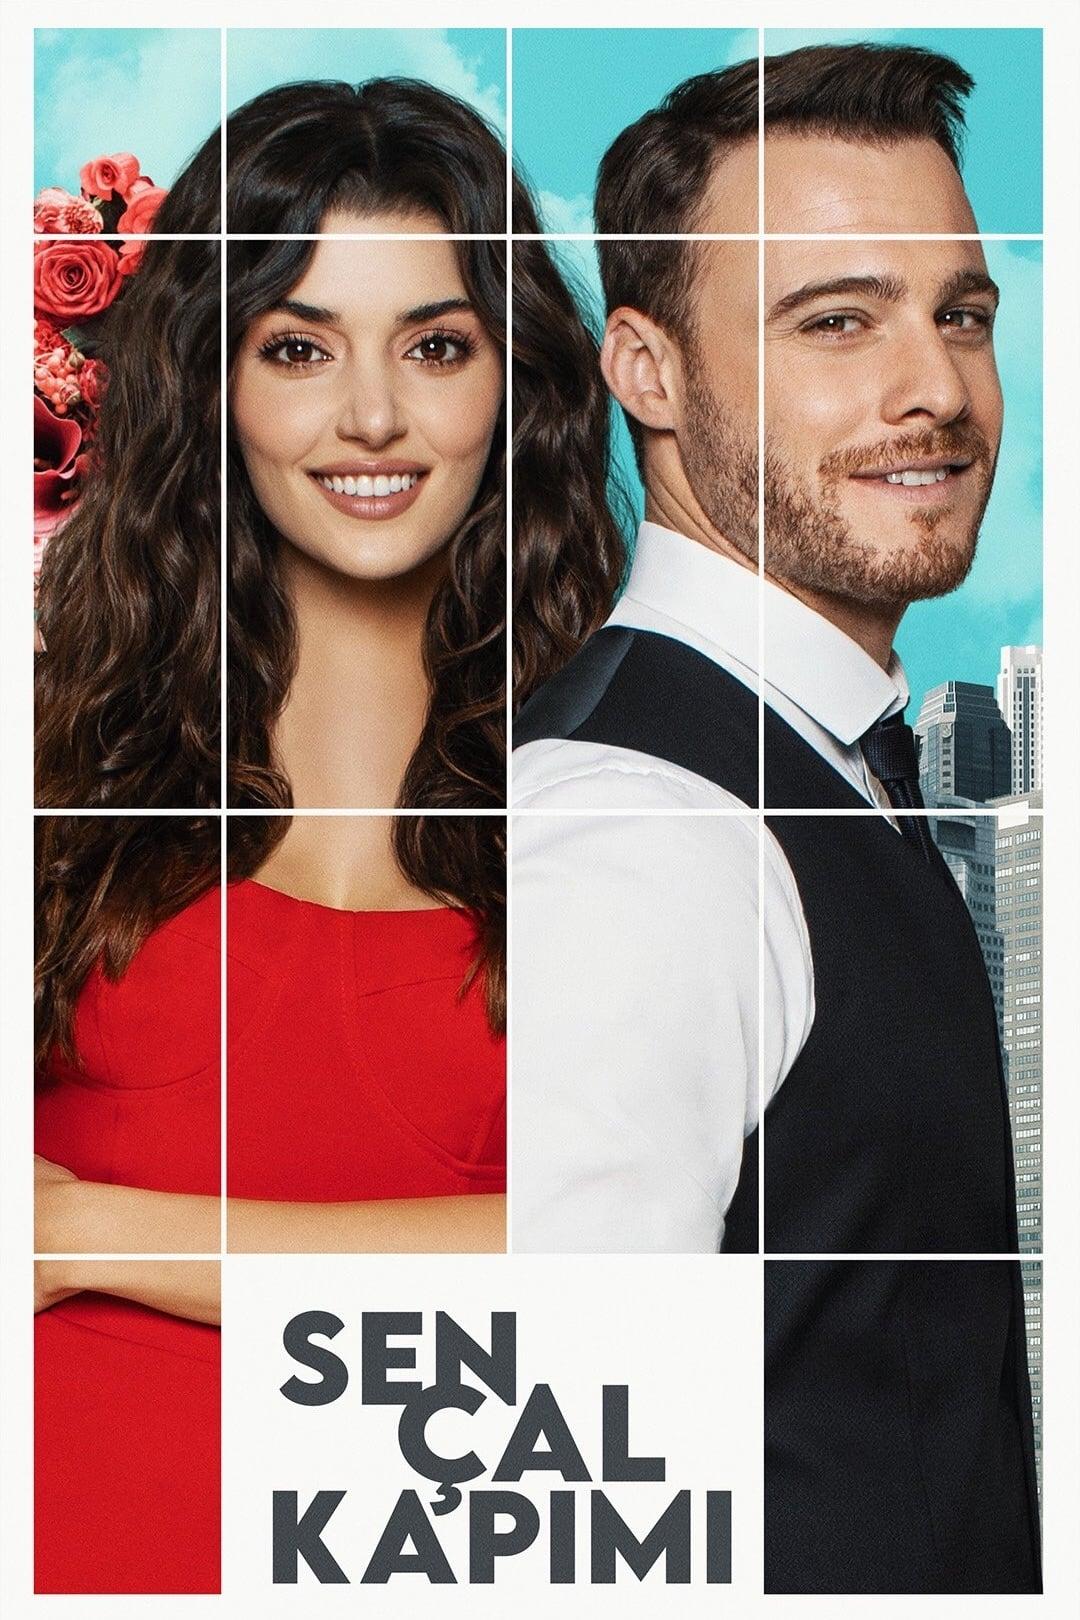 Sen Çal Kapimi series tv complet